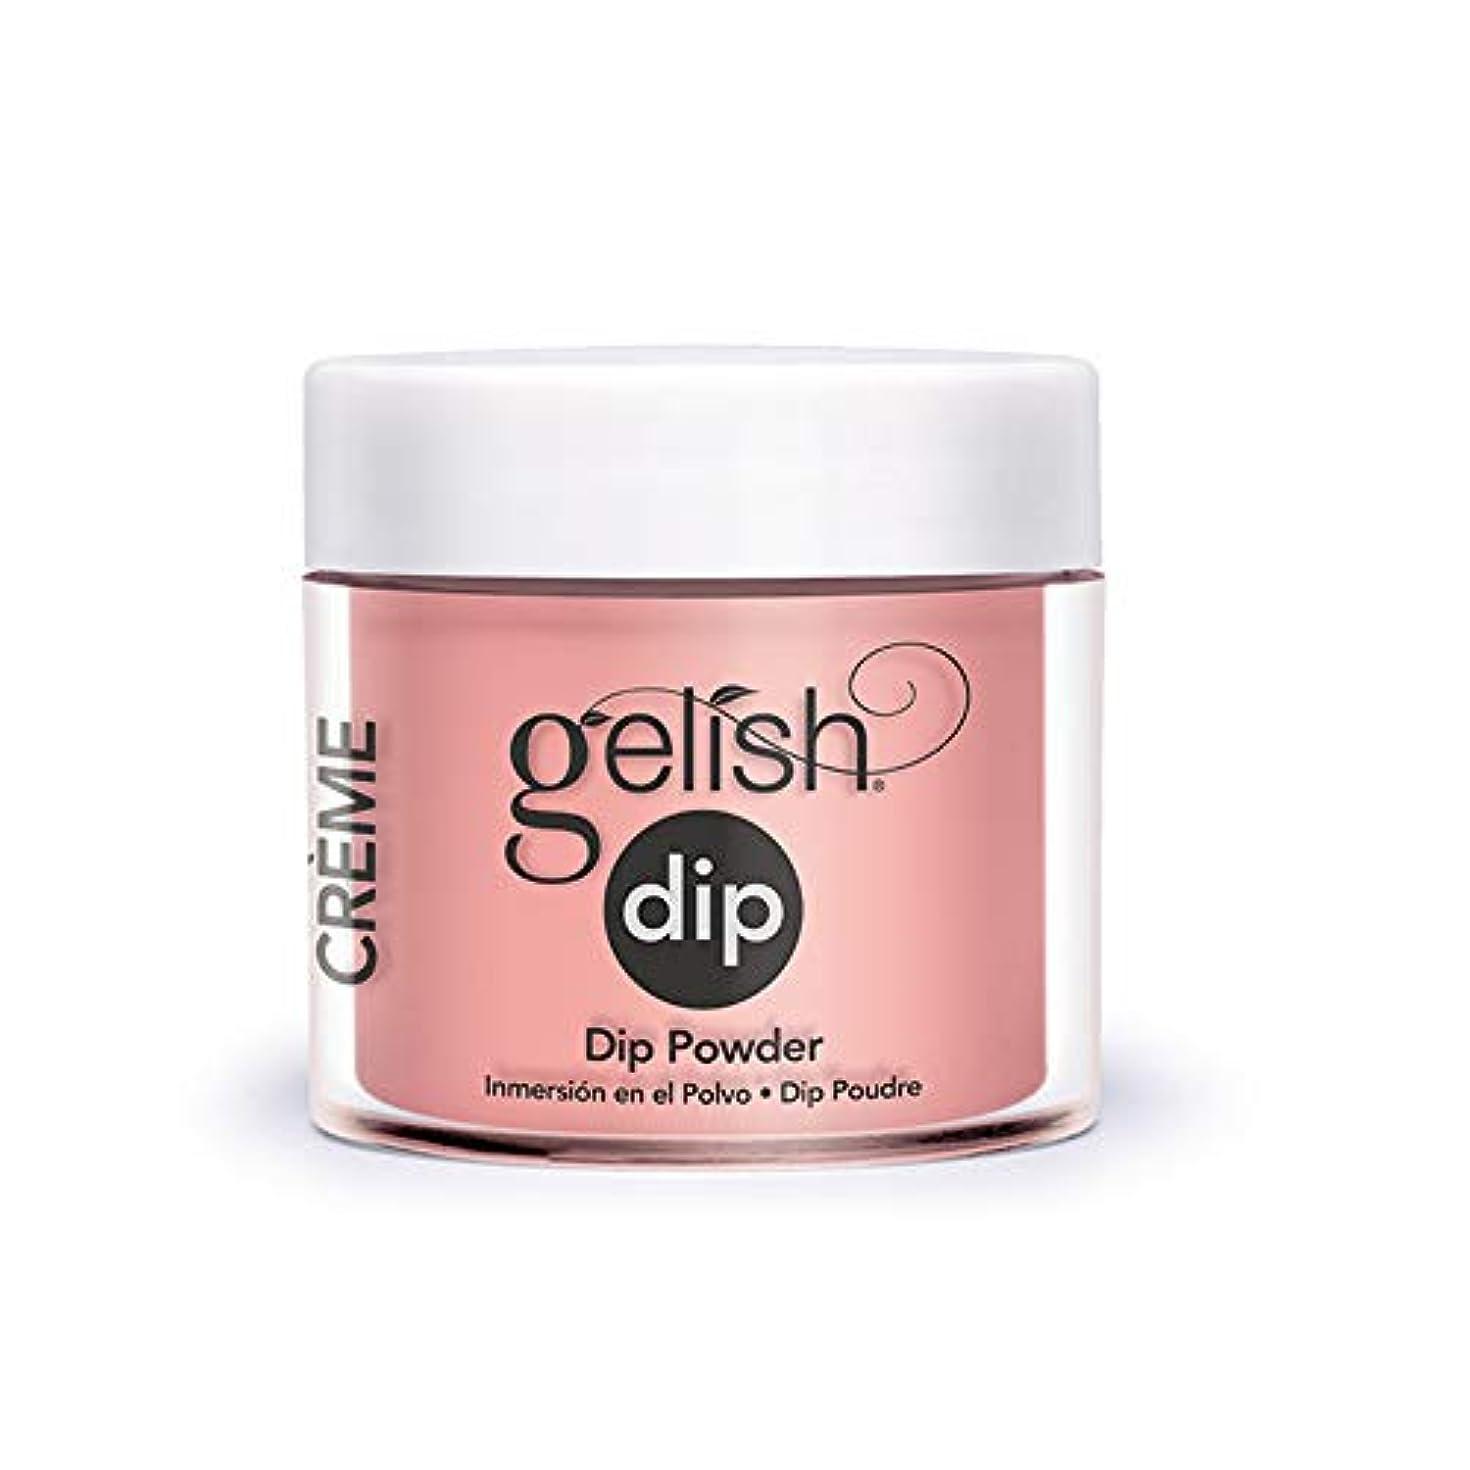 手肉屋神経衰弱Harmony Gelish - Acrylic Dip Powder - Don't Worry, Be Brilliant - 23g / 0.8oz